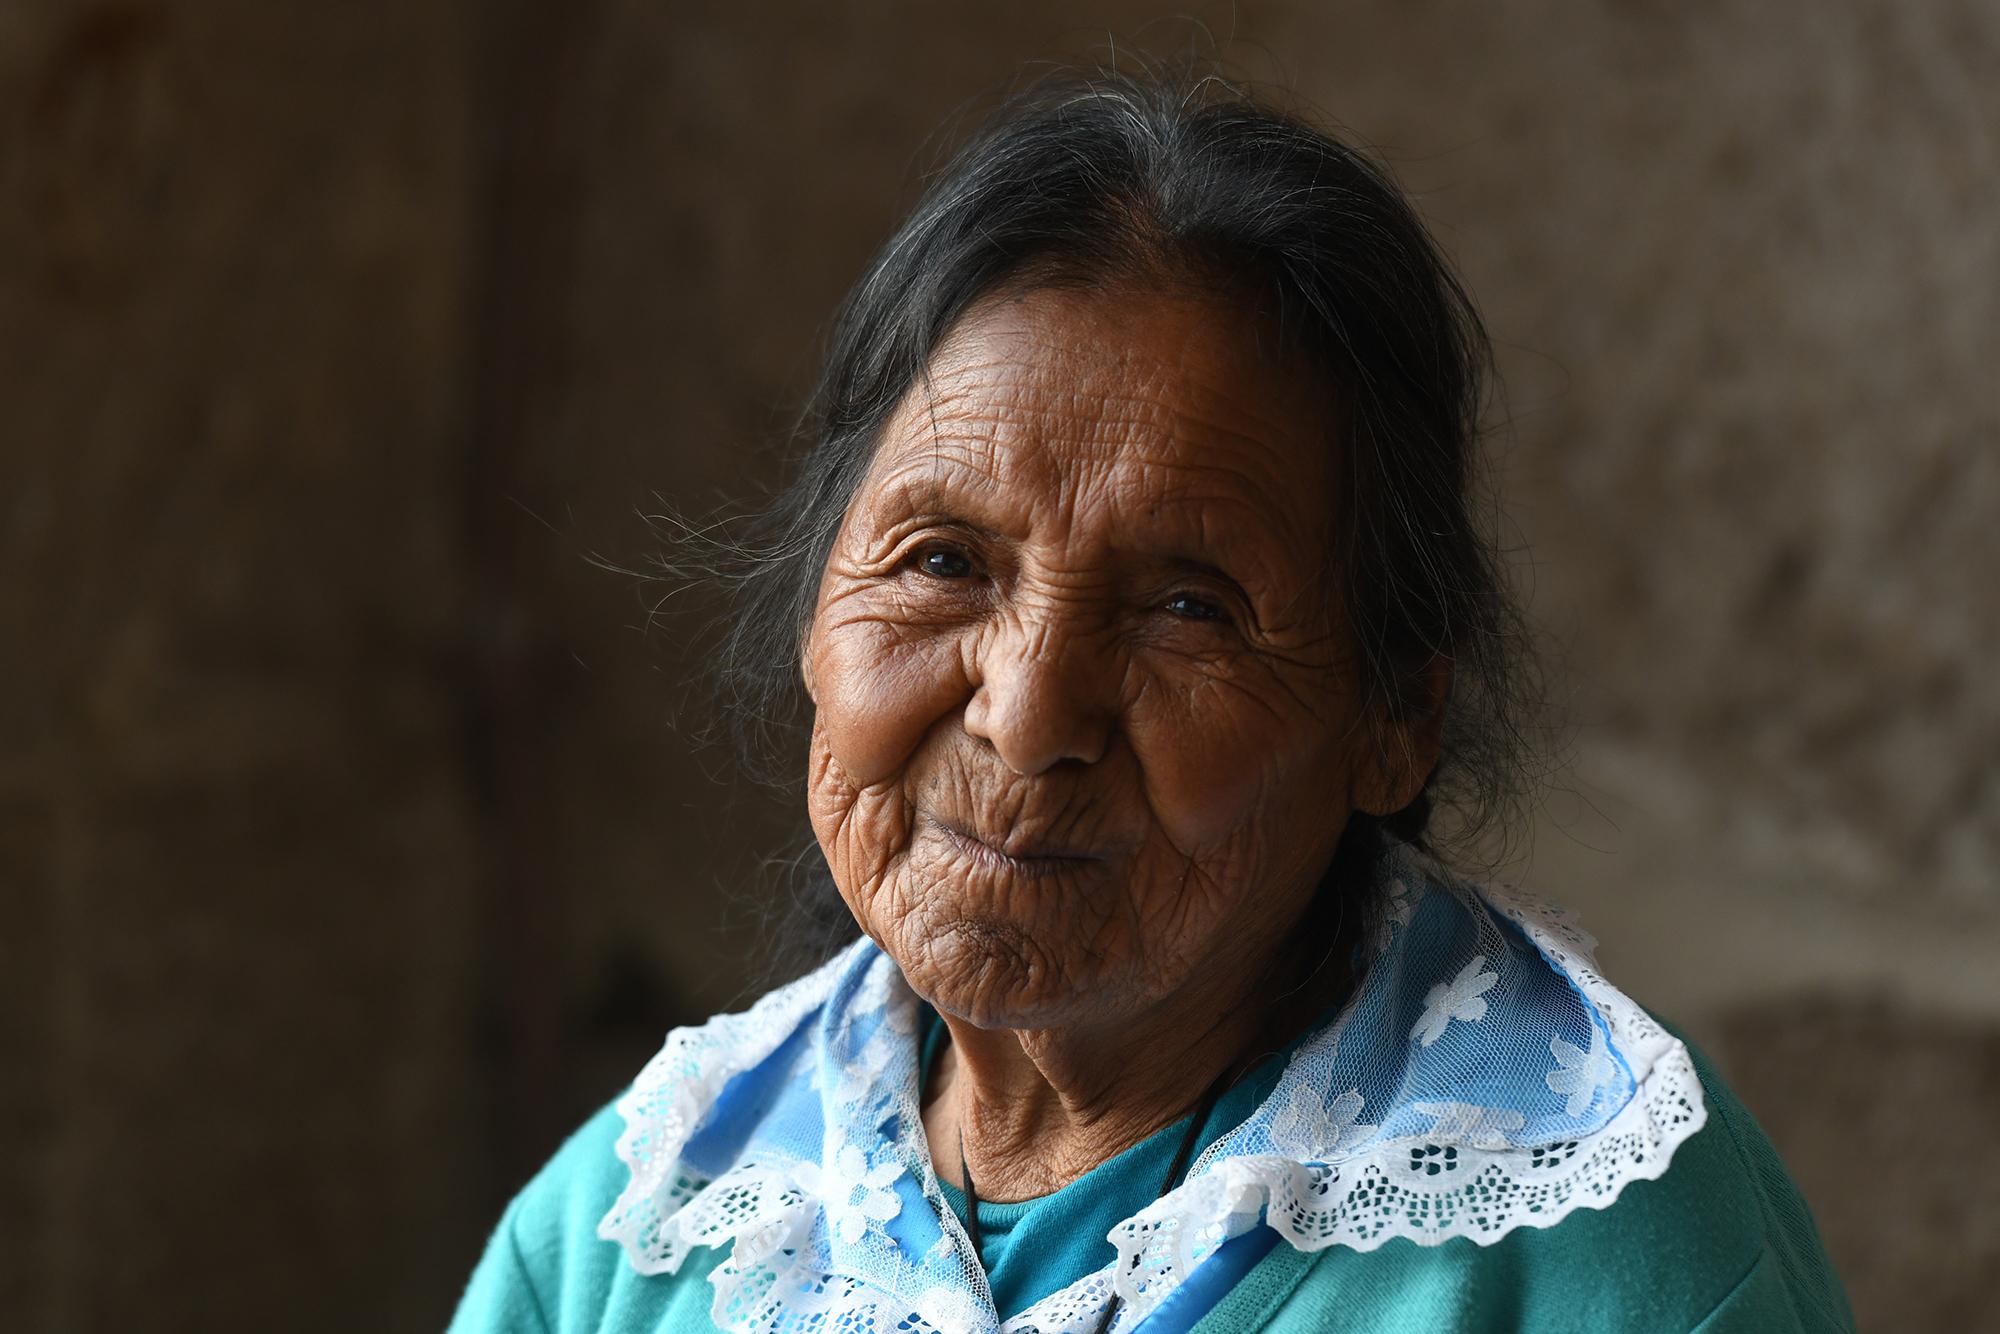 Abuelita. Michocán, México.